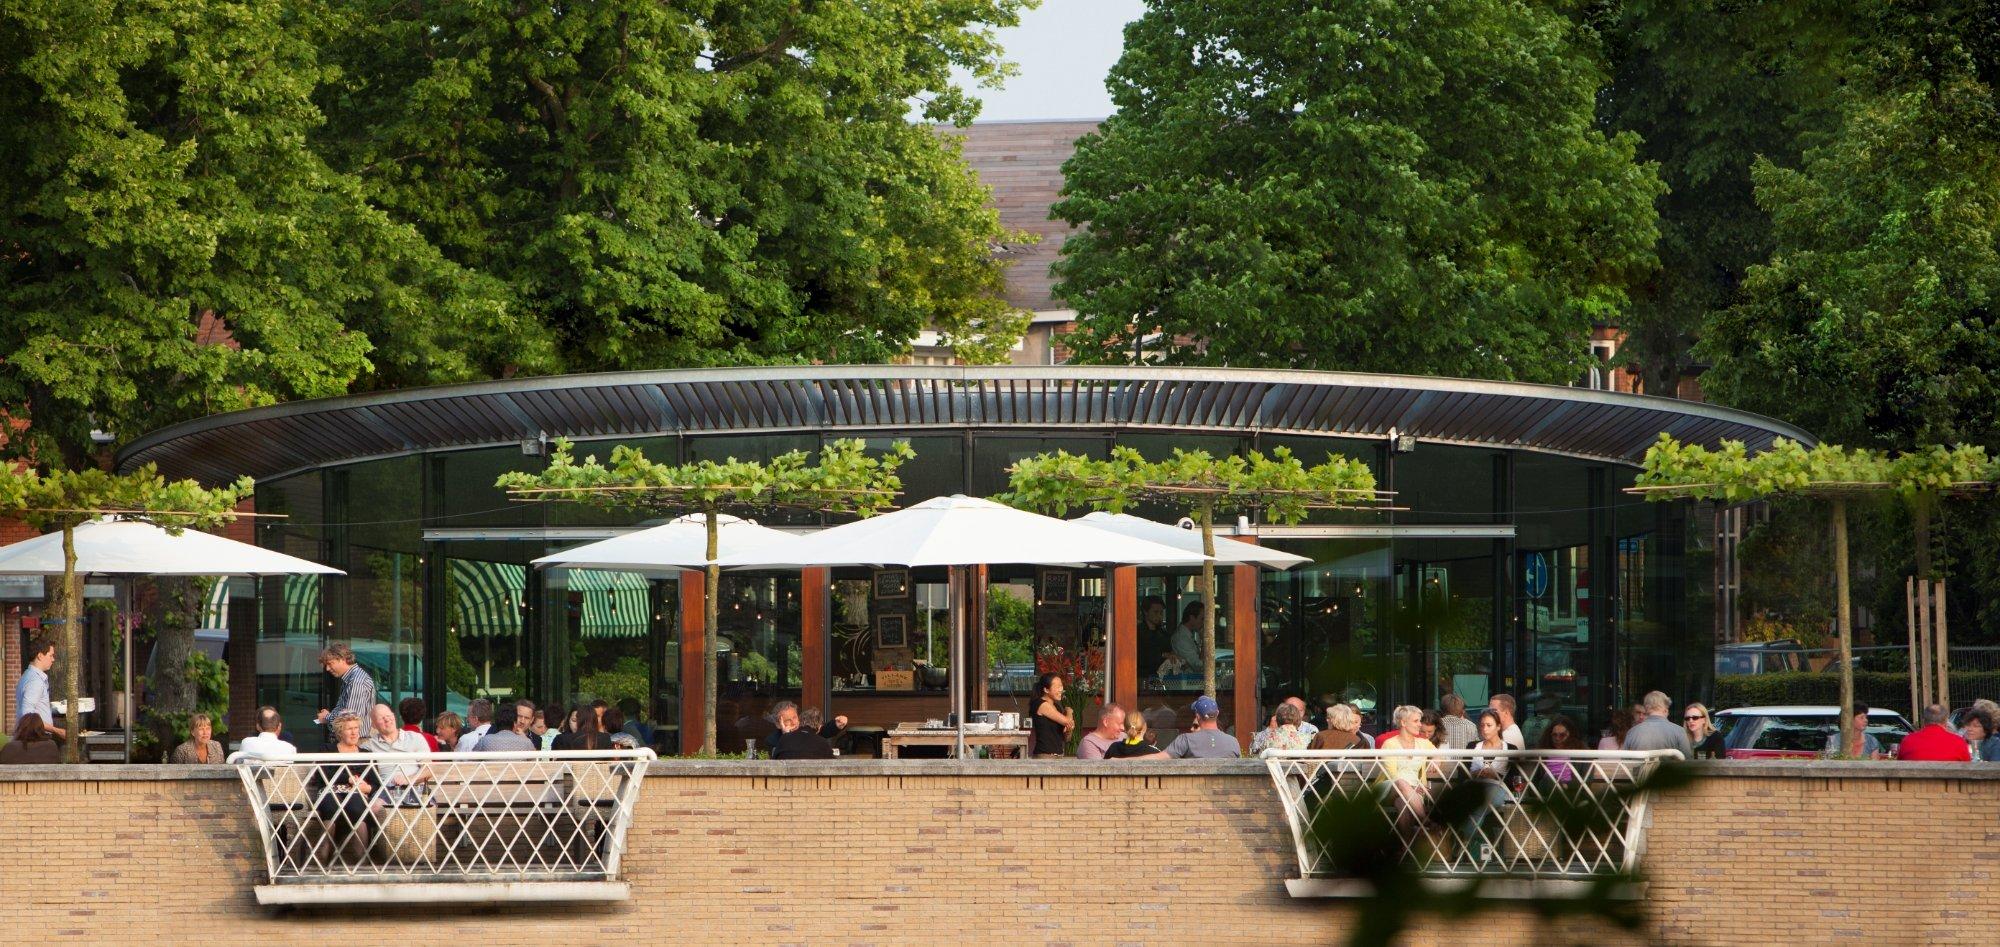 Things To Do in Dutch, Restaurants in Dutch